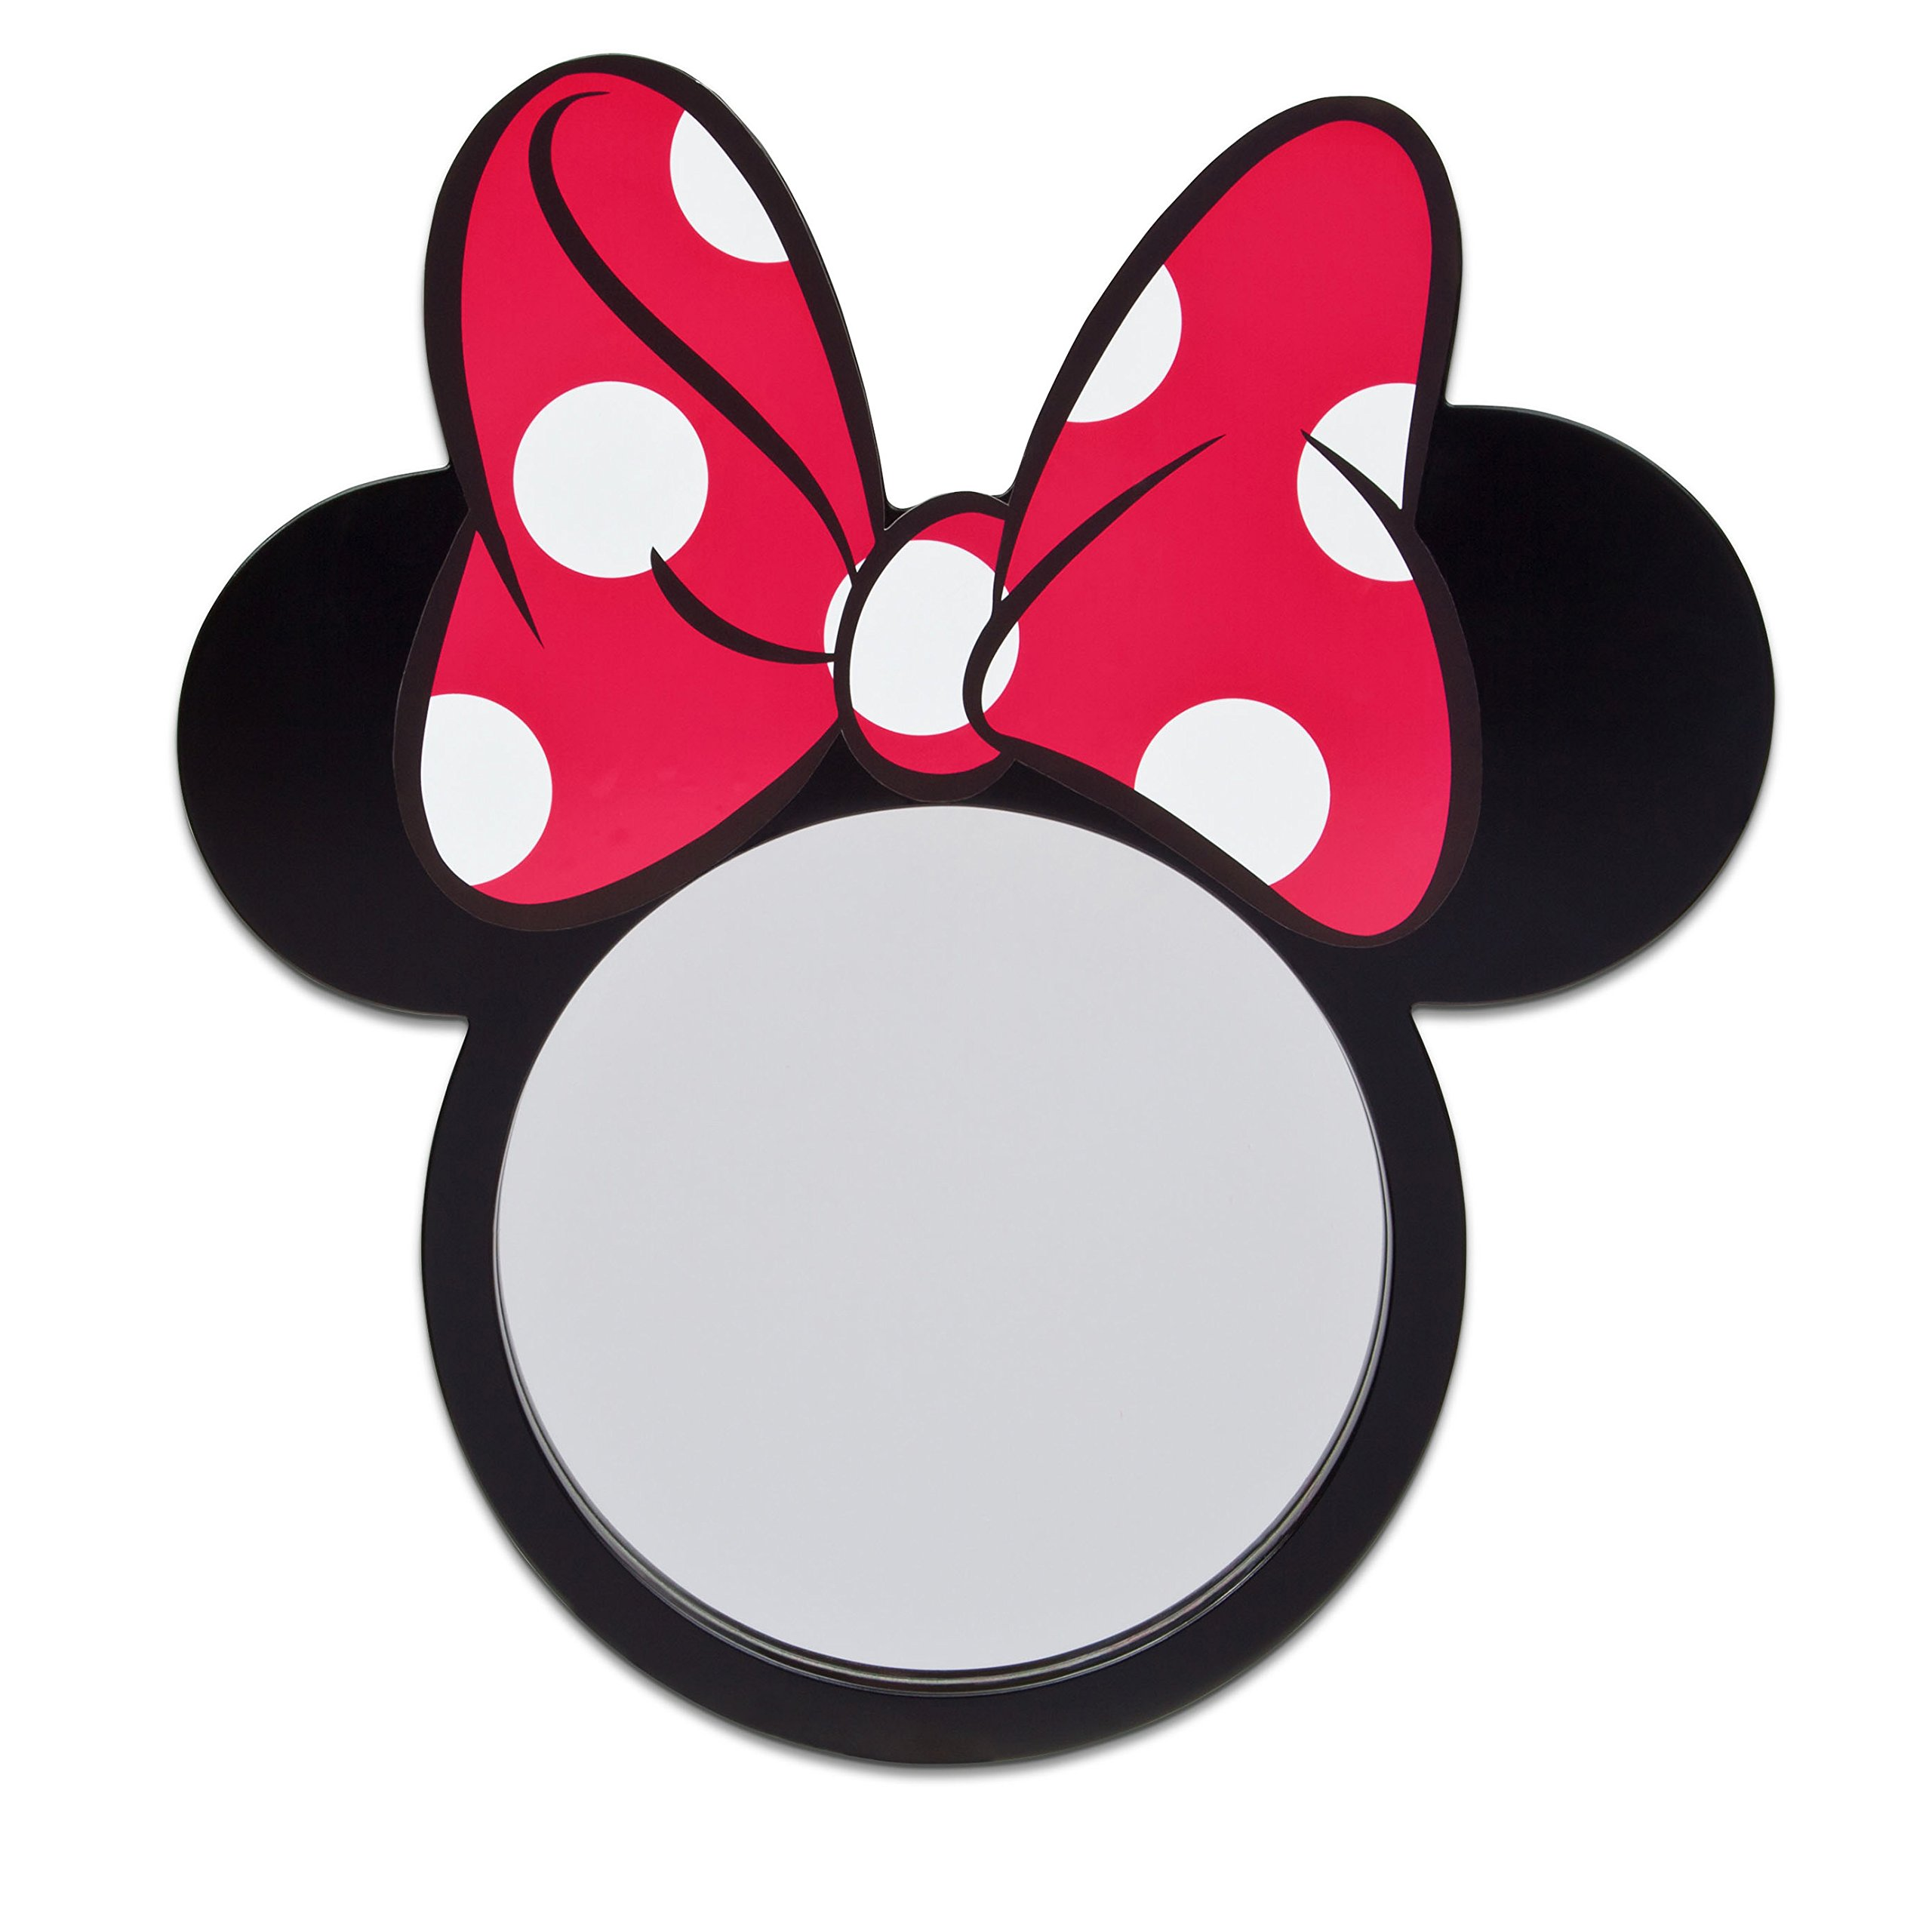 Delta Children Twin Bedroom Collection, Disney Minnie Mouse by Delta Children (Image #5)